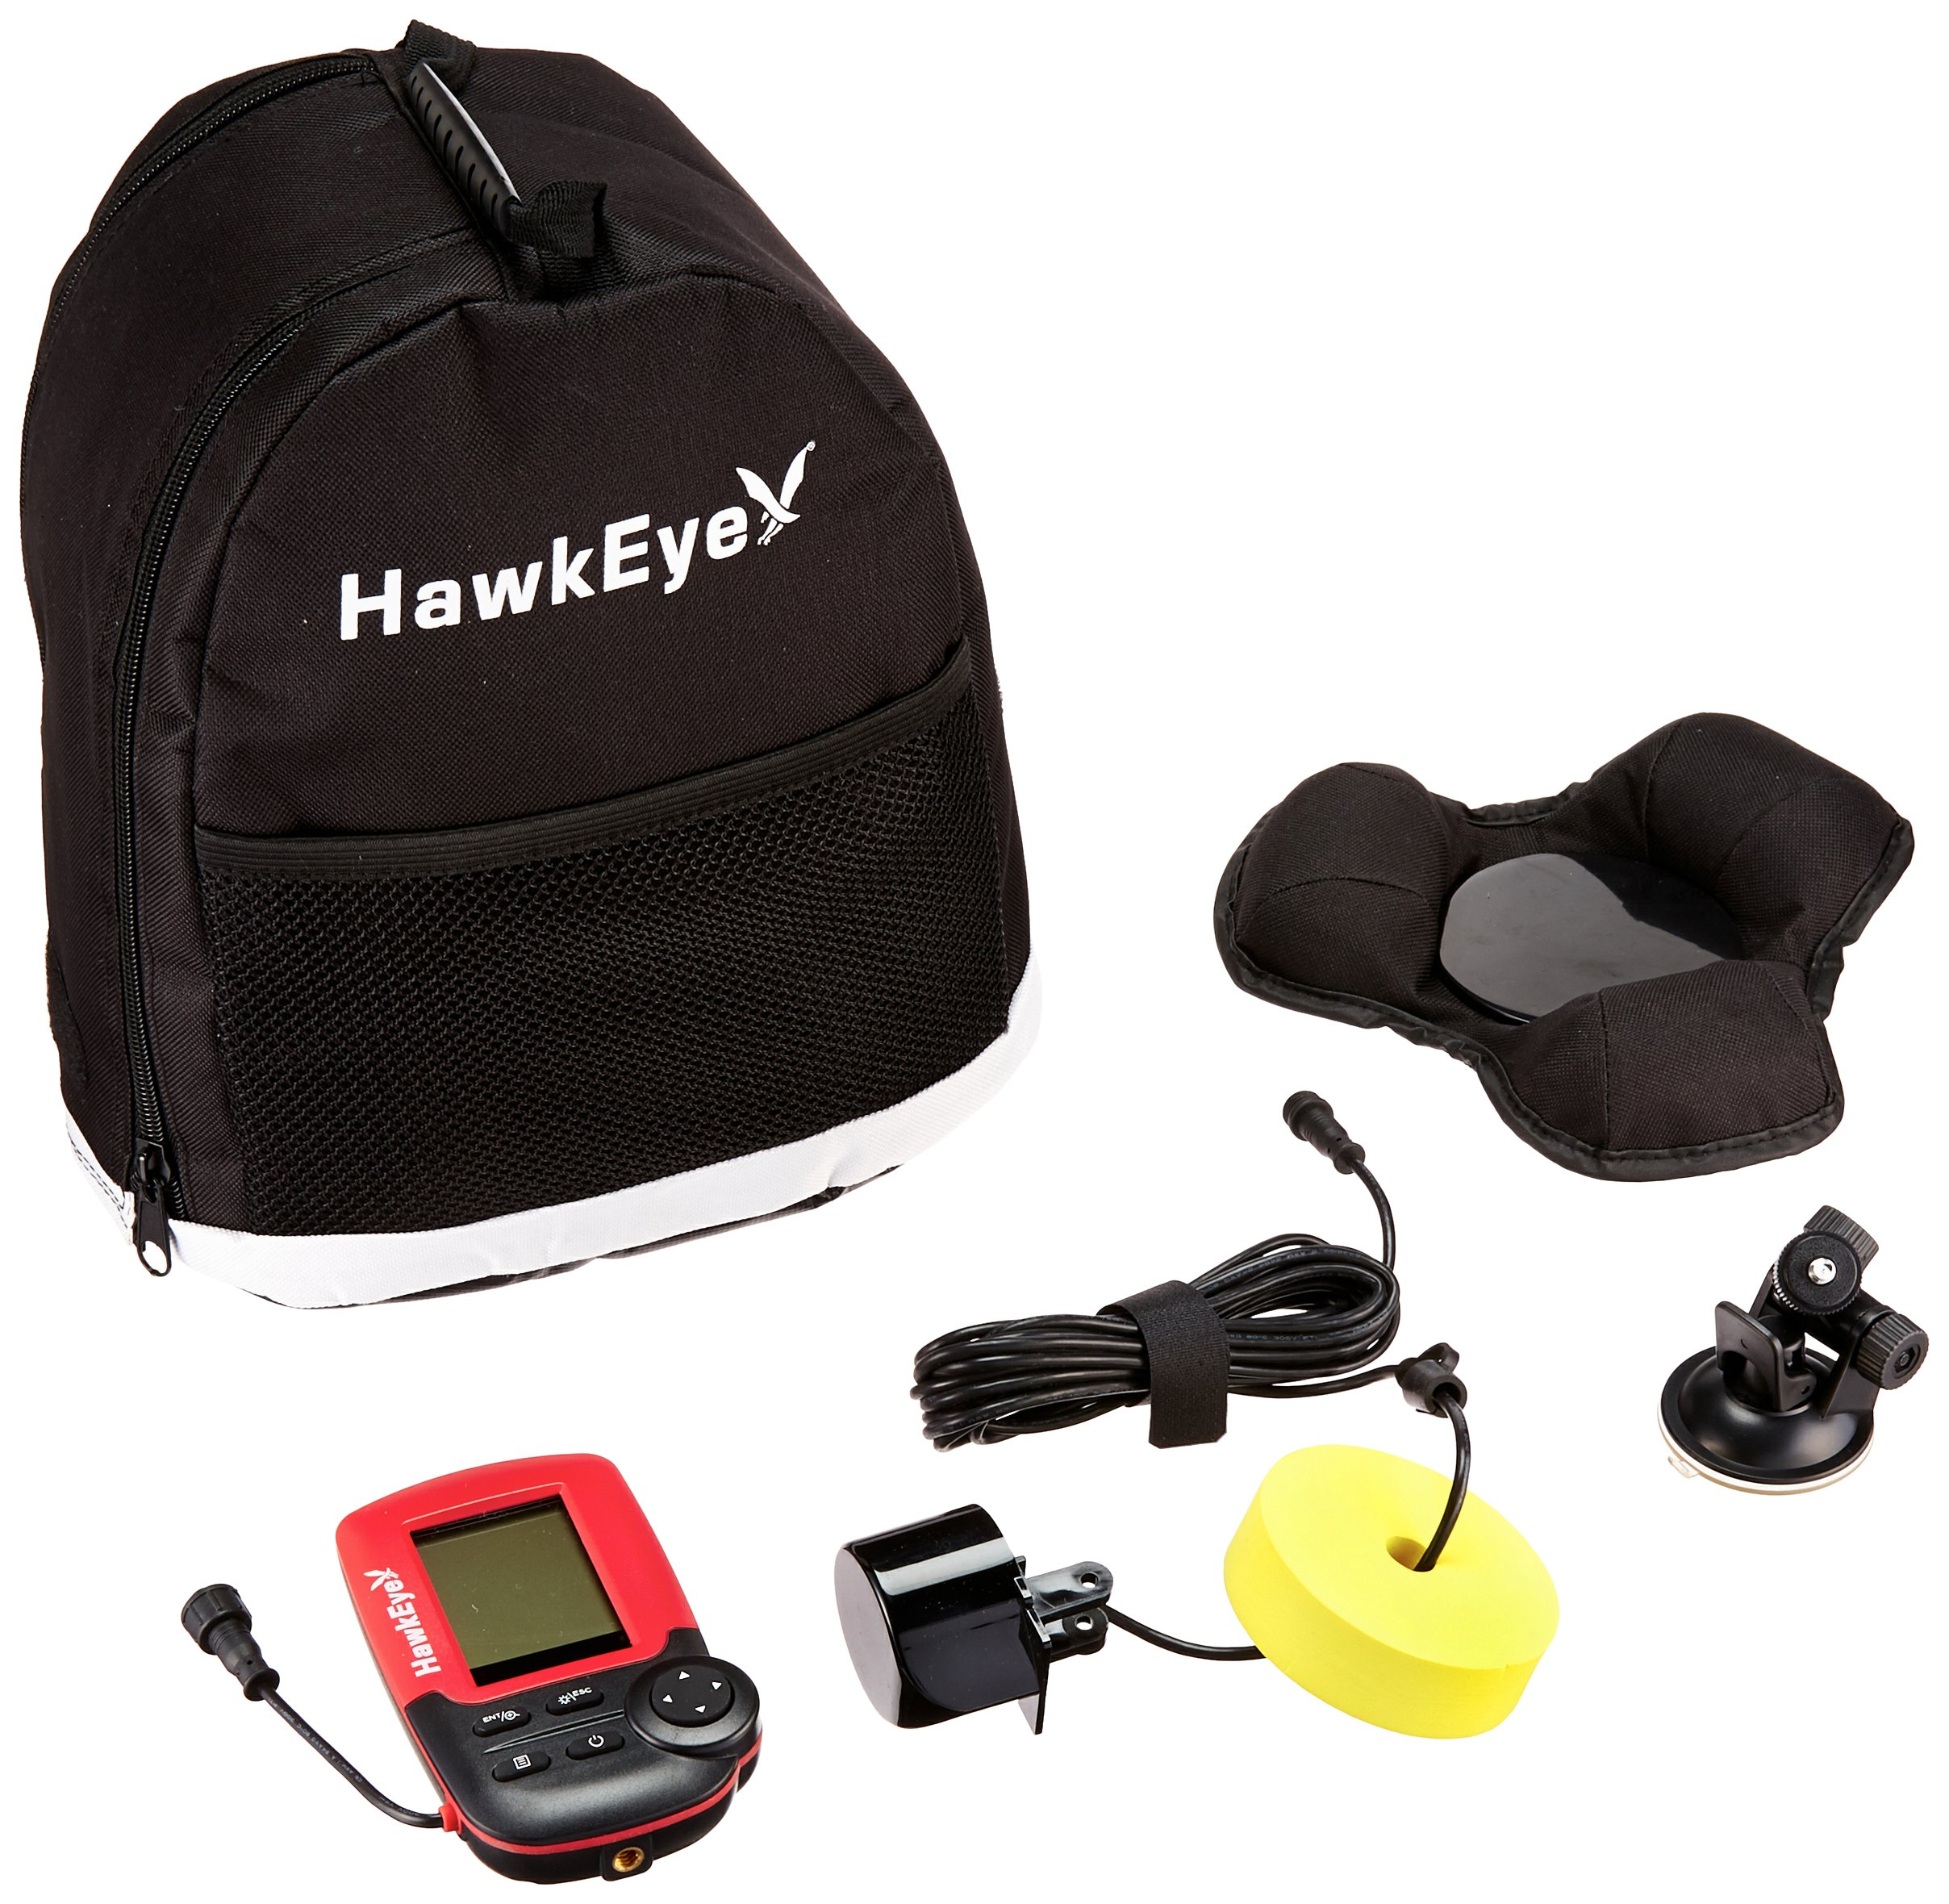 HawkEye FT1PXi FishTrax 1X IceShack Kit by HawkEye